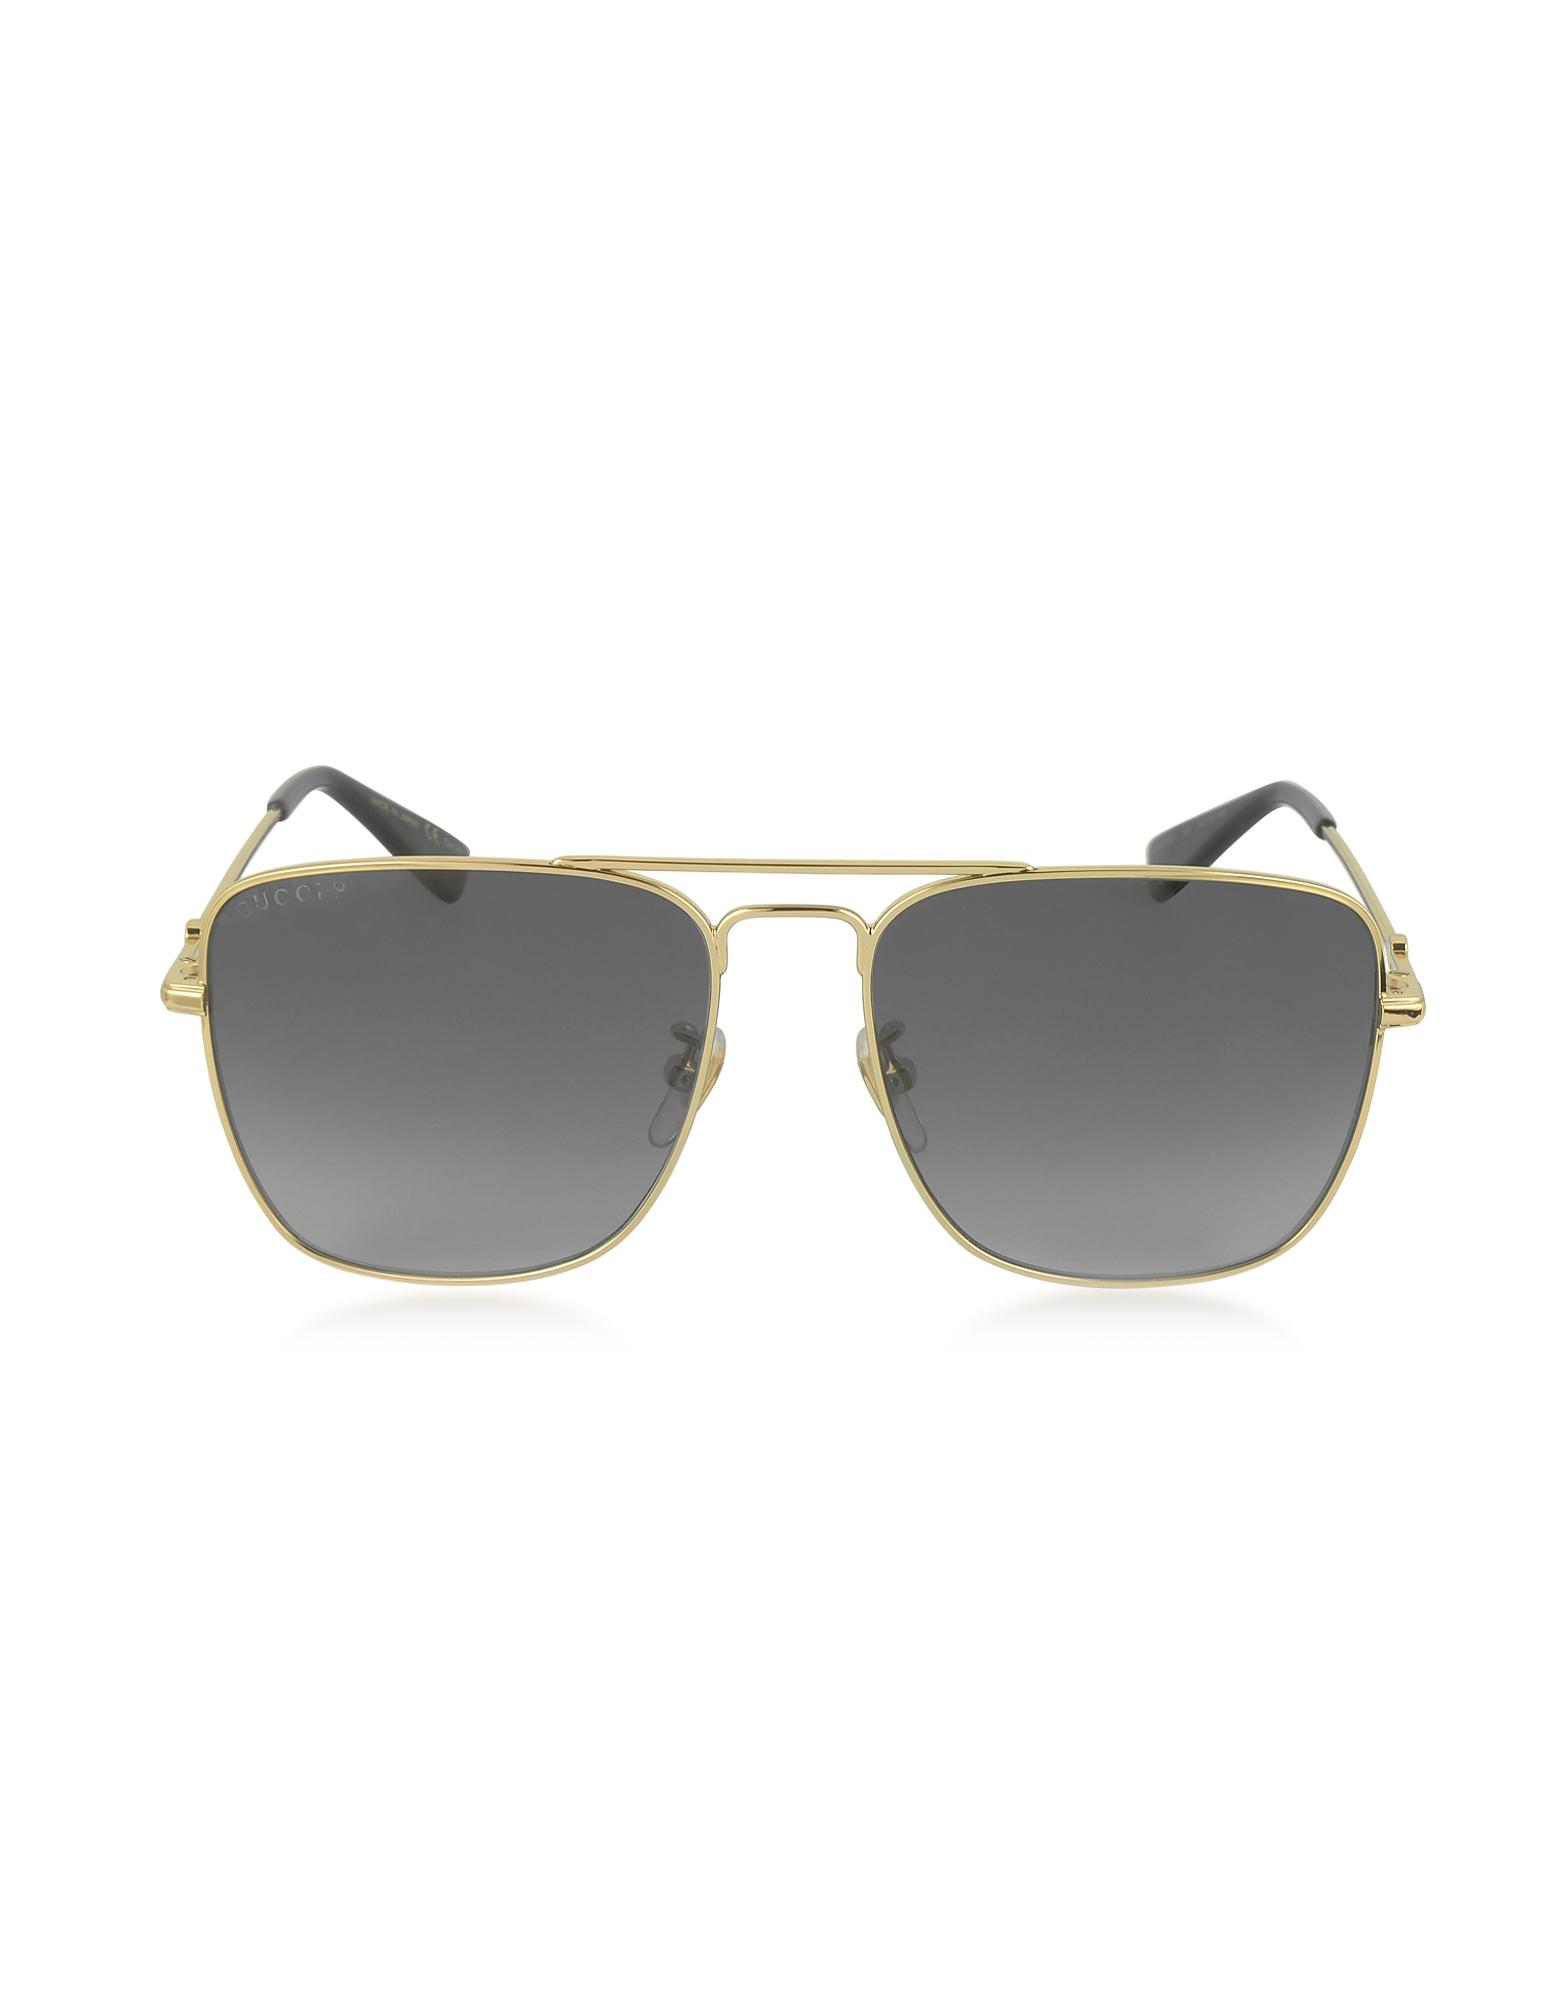 7671b60eff7 Gucci. Metallic GG0108S 006 Gold Metal Square Aviator Men s Polarized  Sunglasses